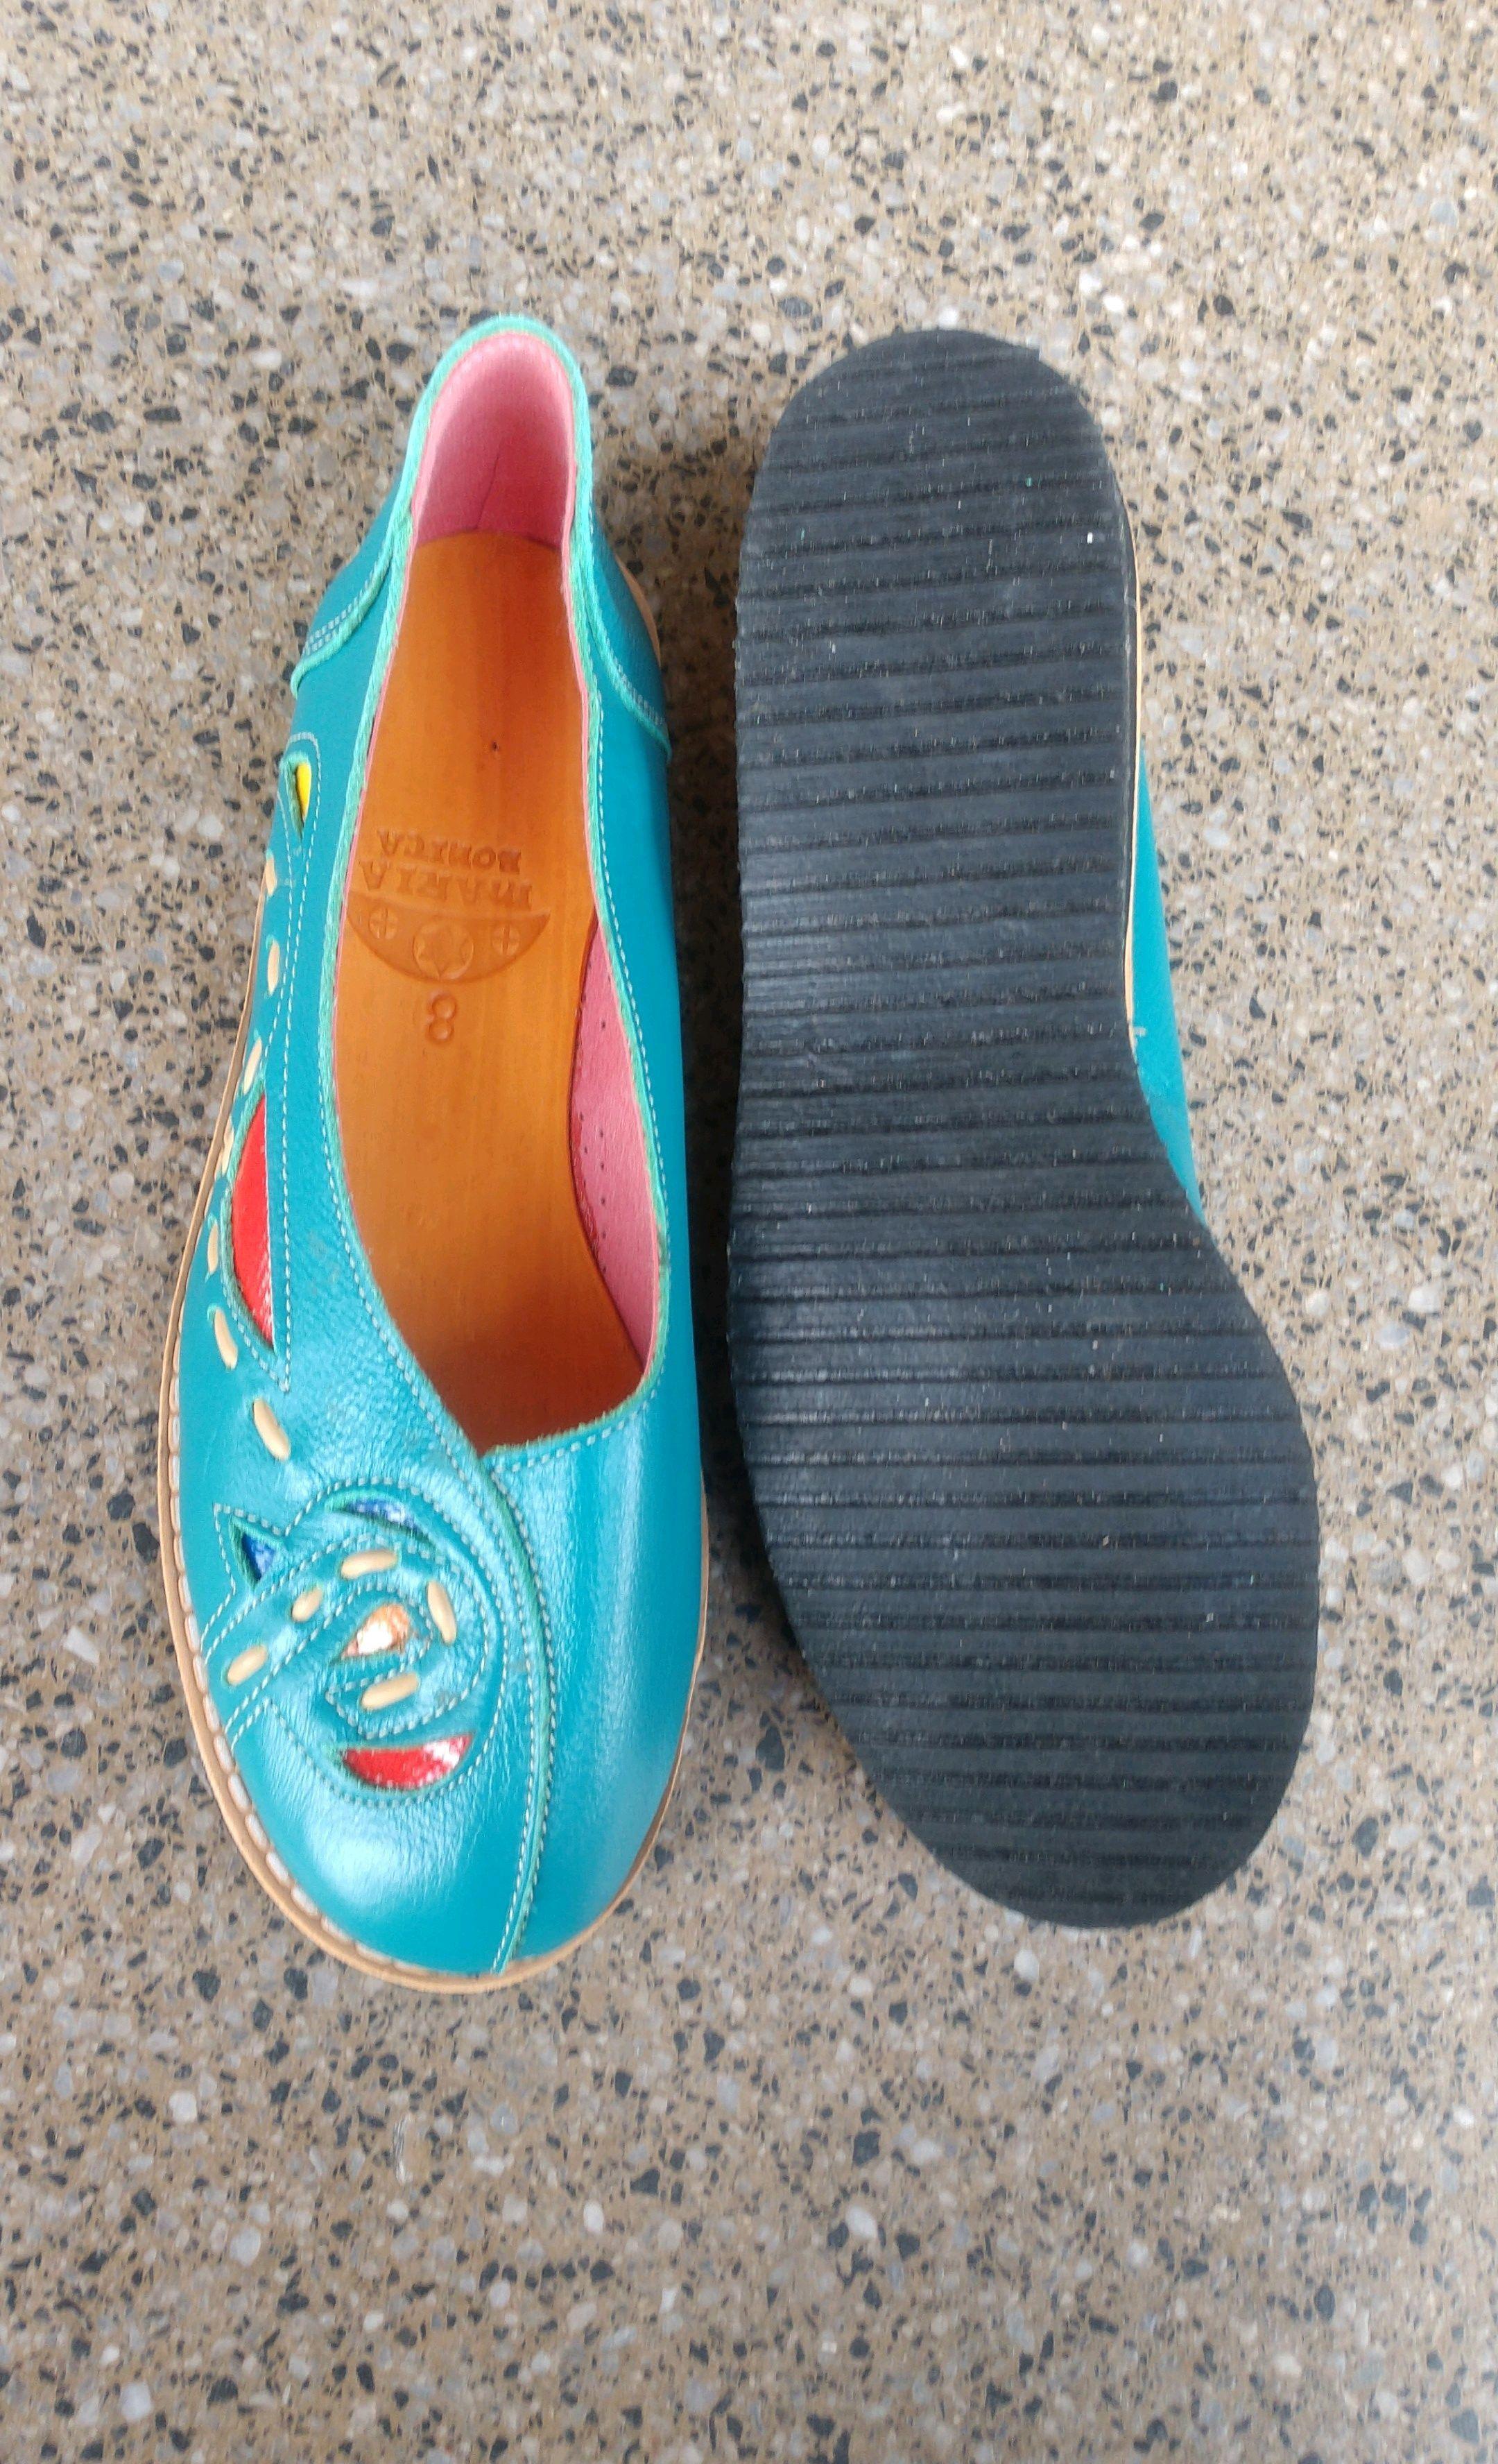 ded7b698c5 Sapato Maria Bonita azul turquesa no Elo7